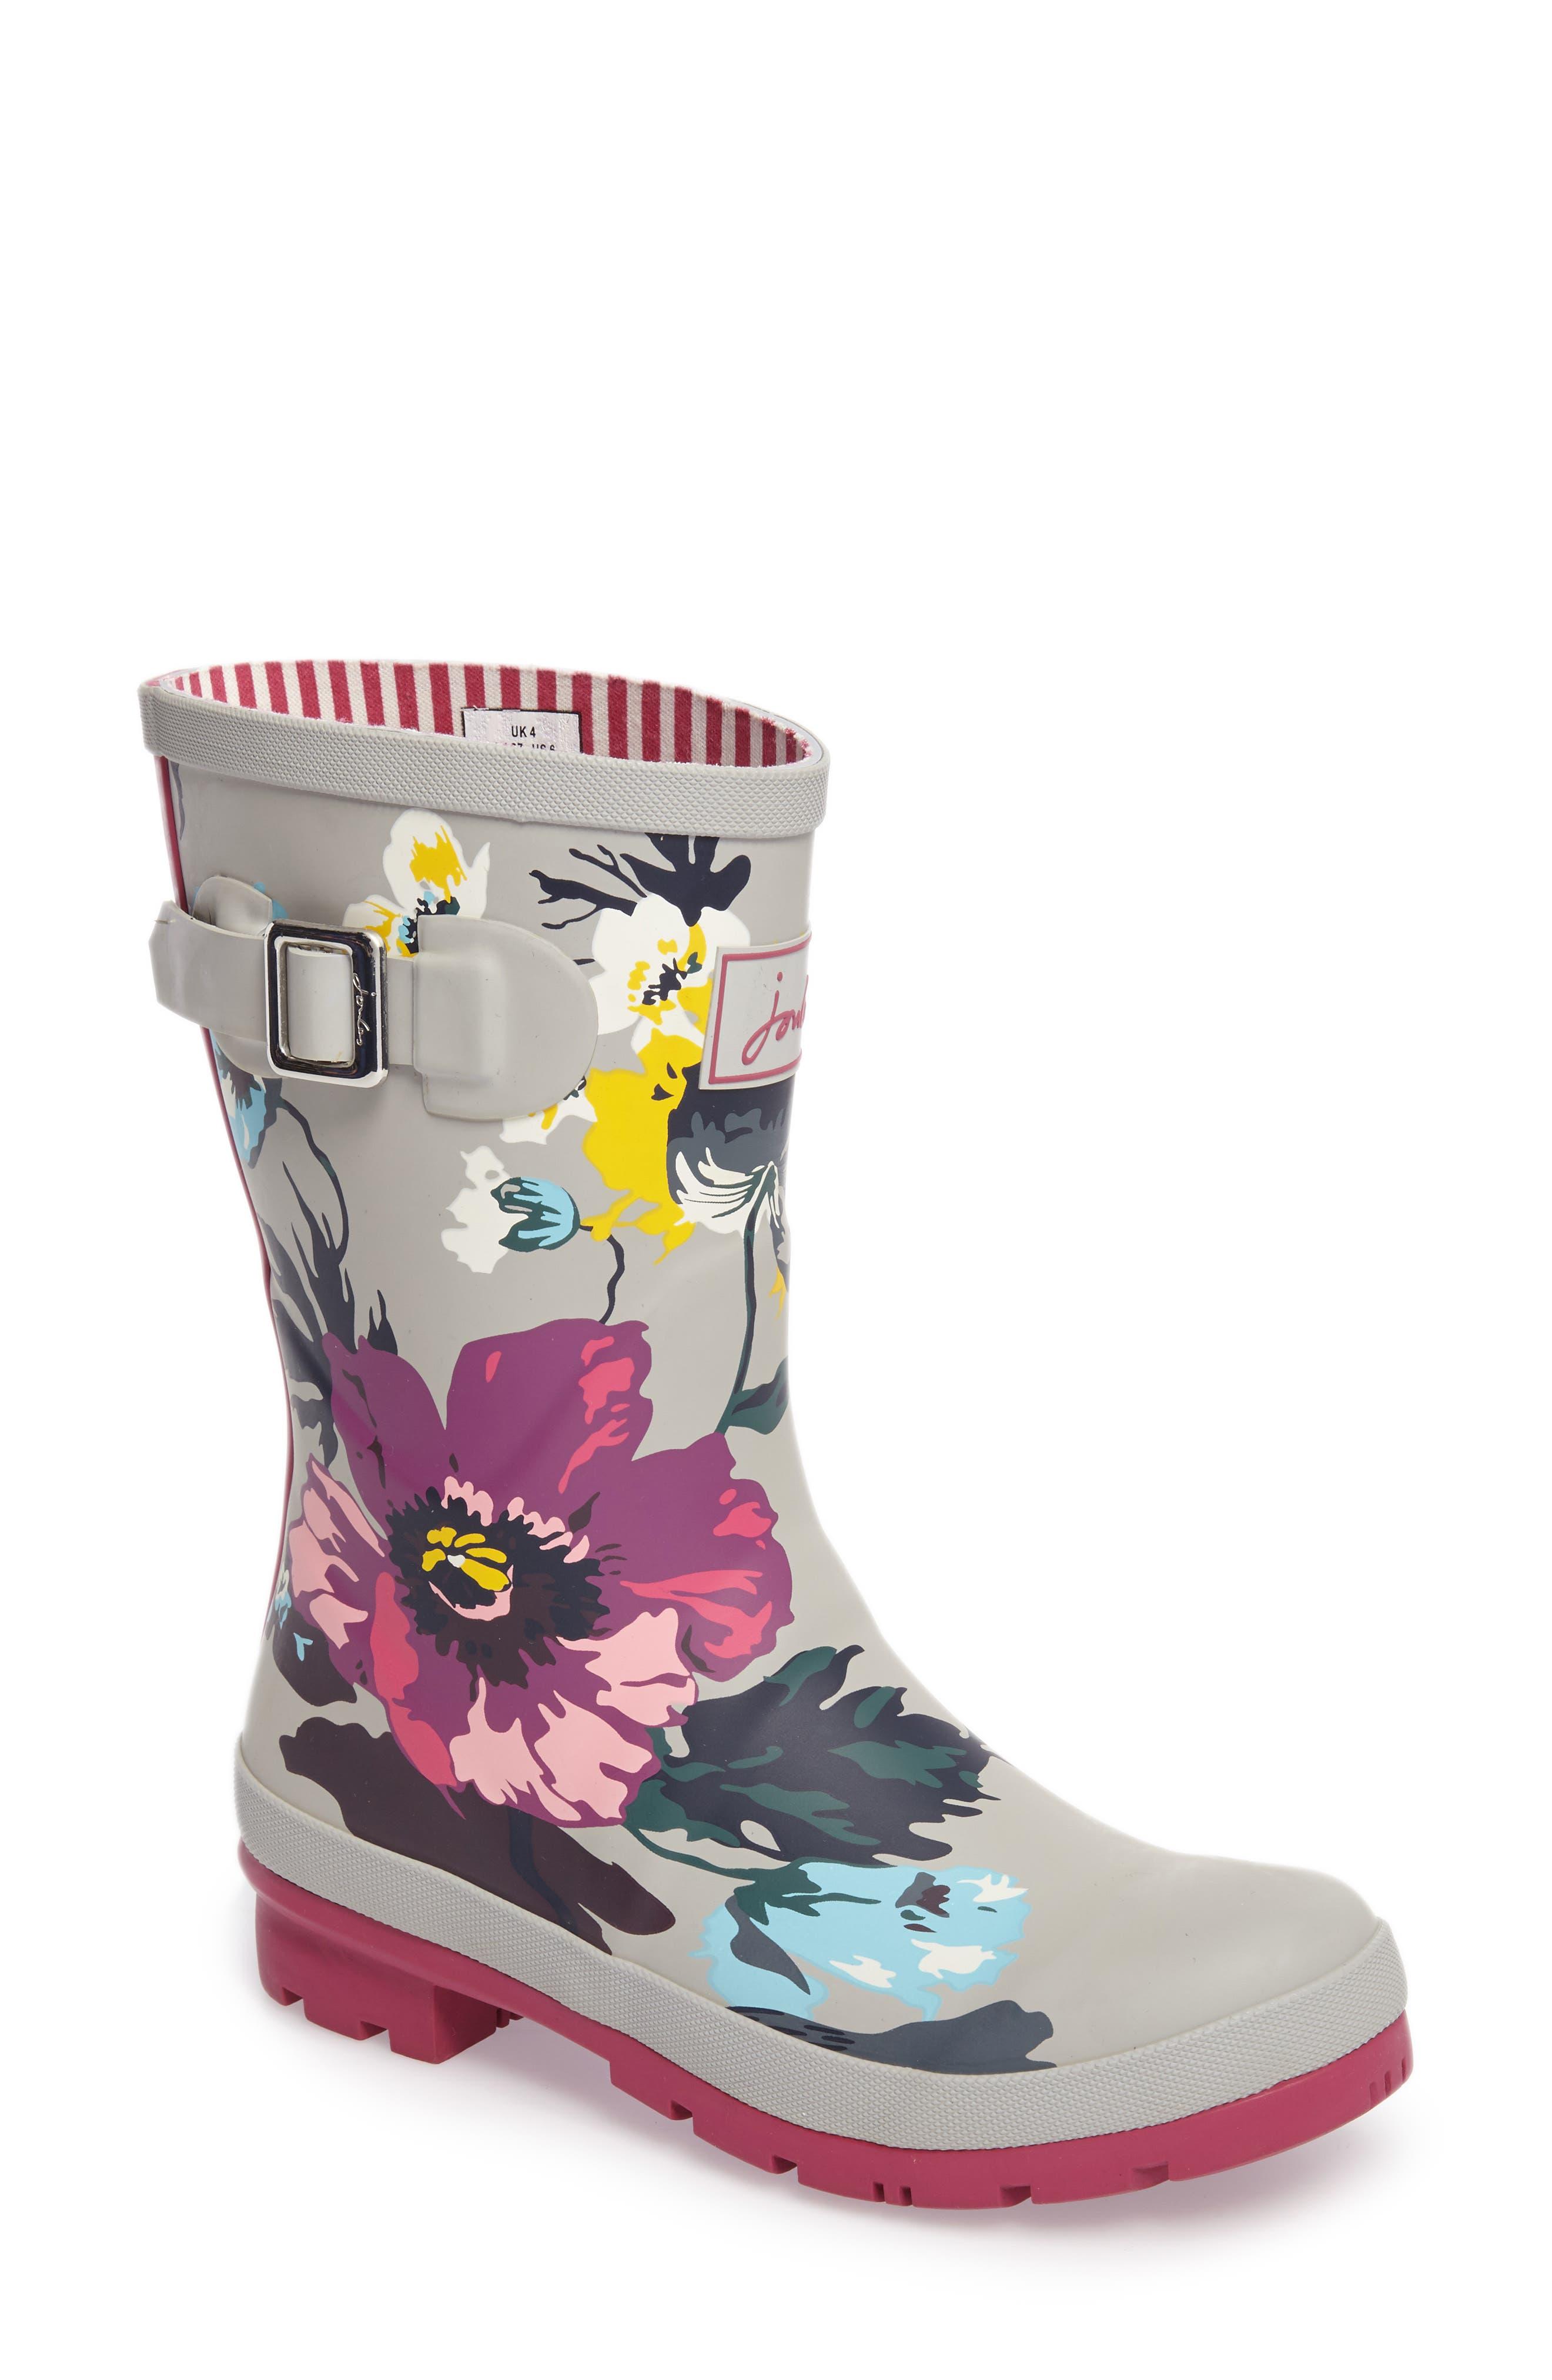 Main Image - Joules 'Molly' Rain Boot (Women)